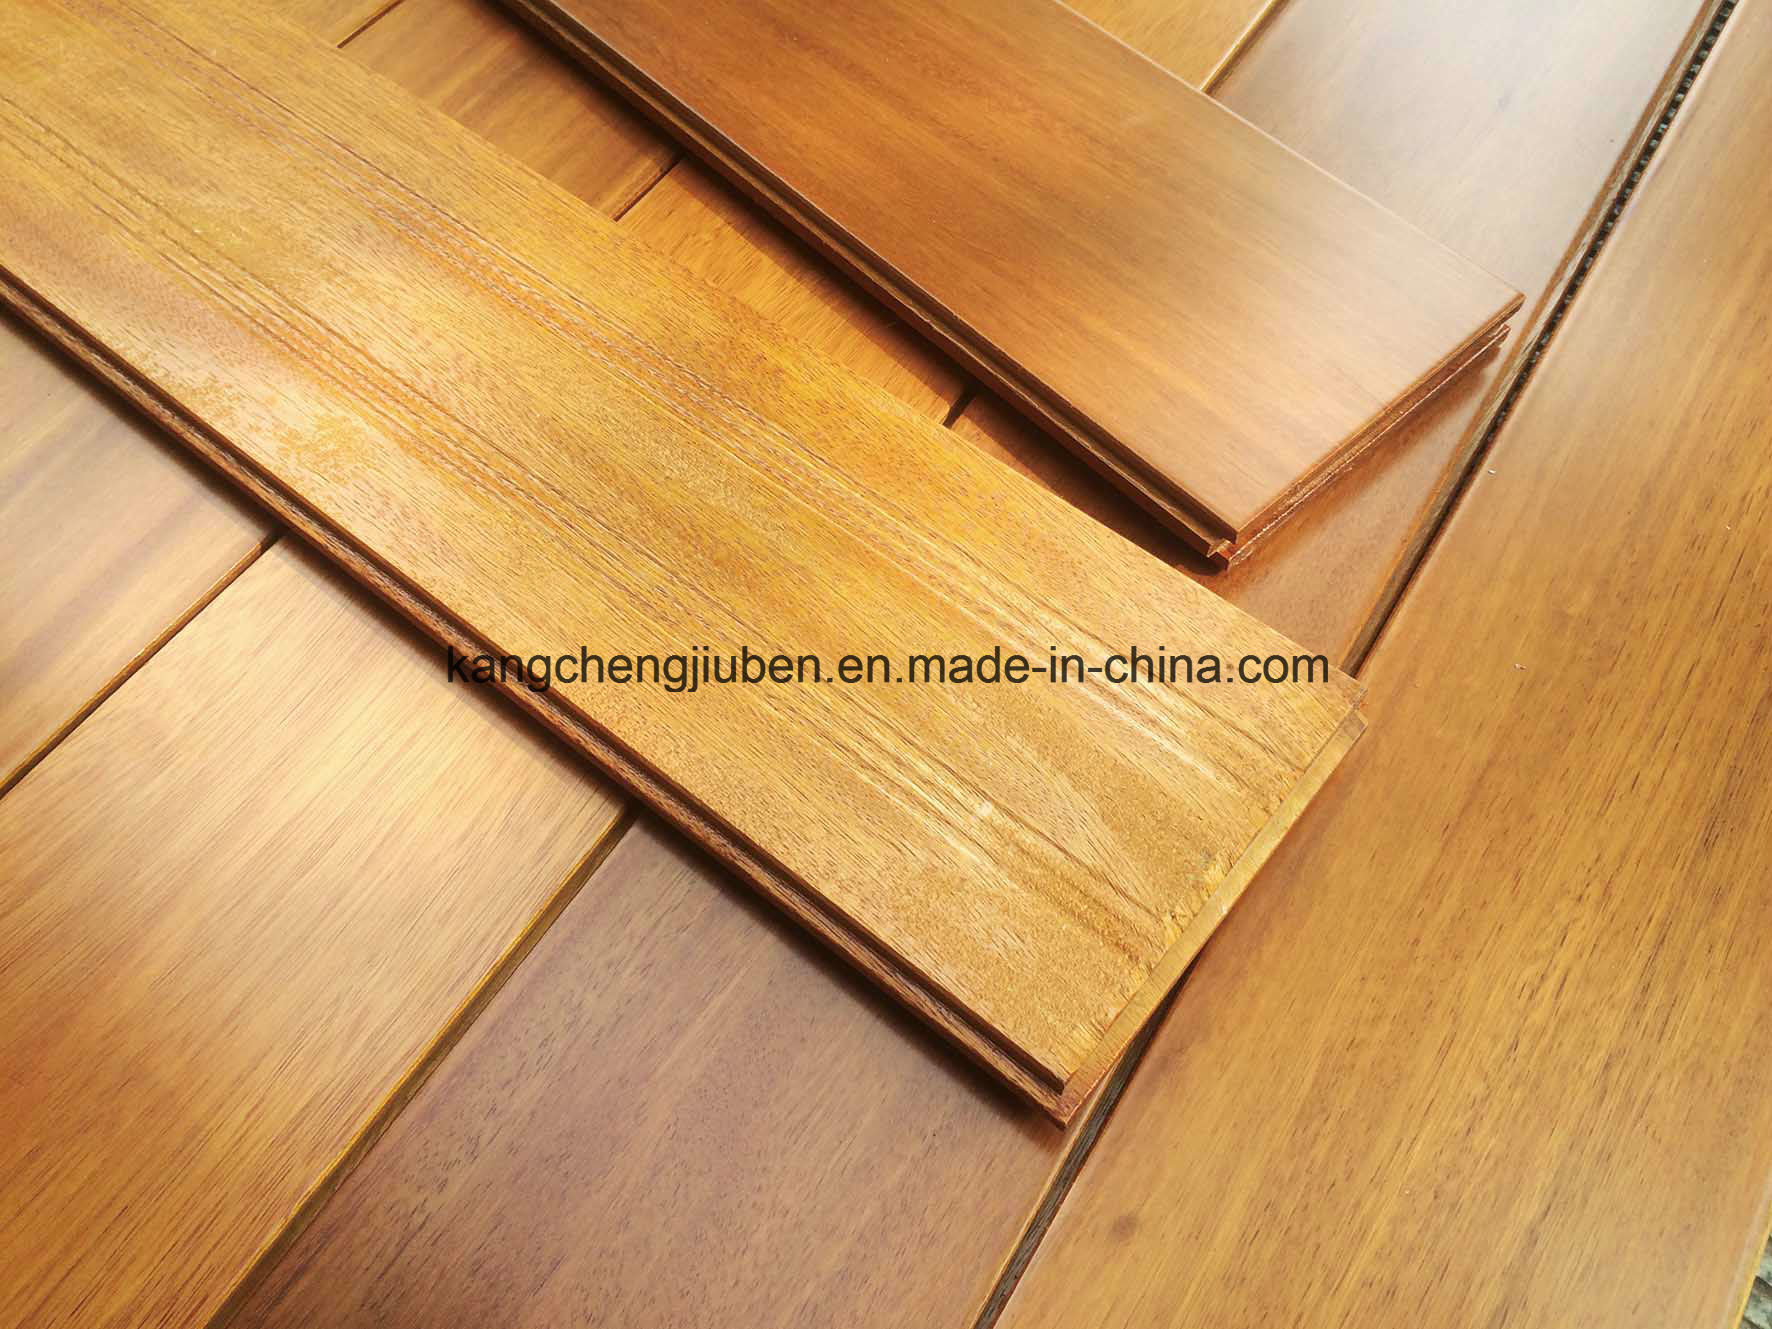 Natural Resistance to Termites Wood Parquet/Hardwood Flooring